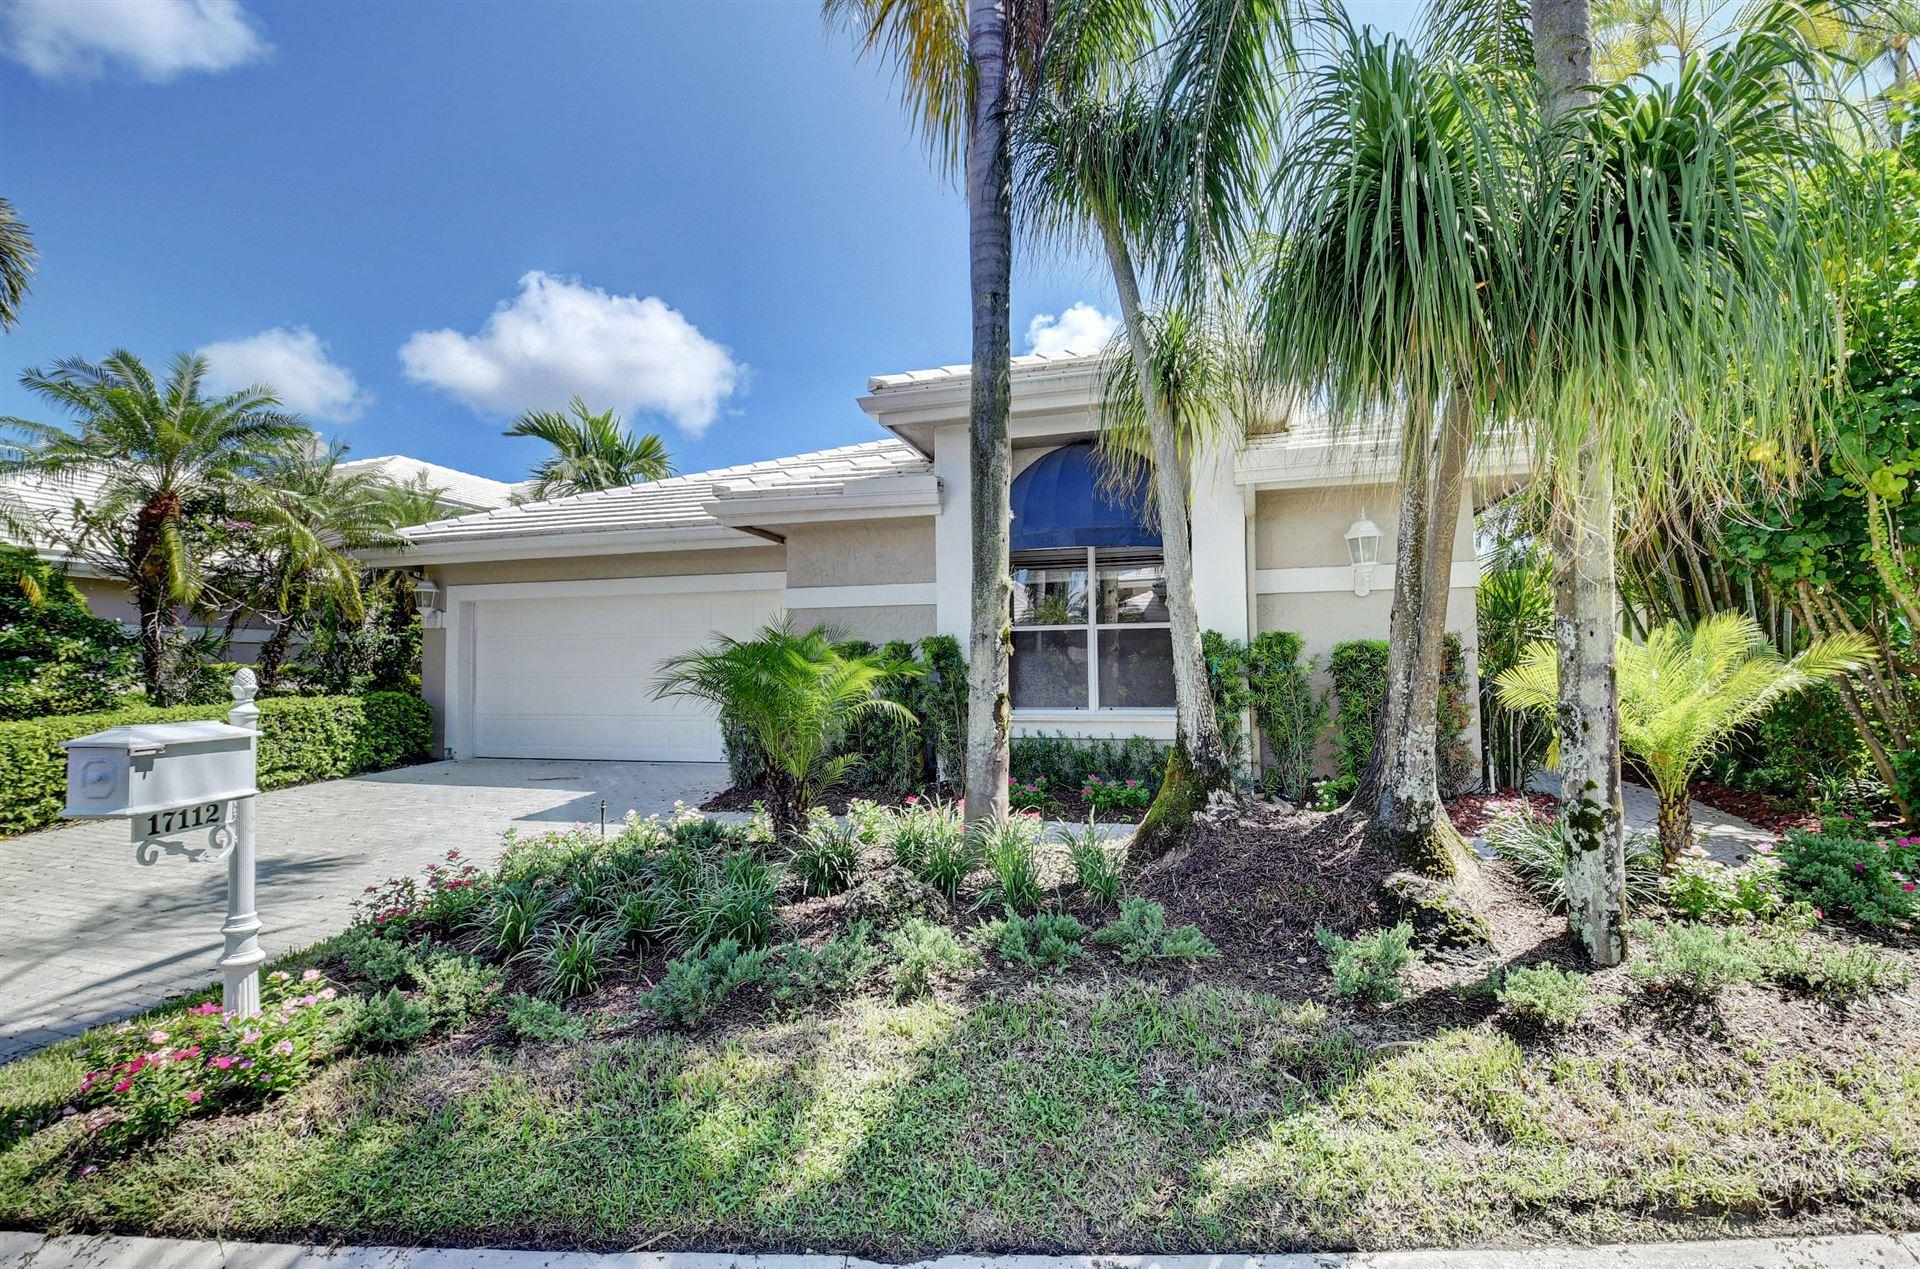 17112 Huntington Park Way, Boca Raton, FL 33496 - #: RX-10656241